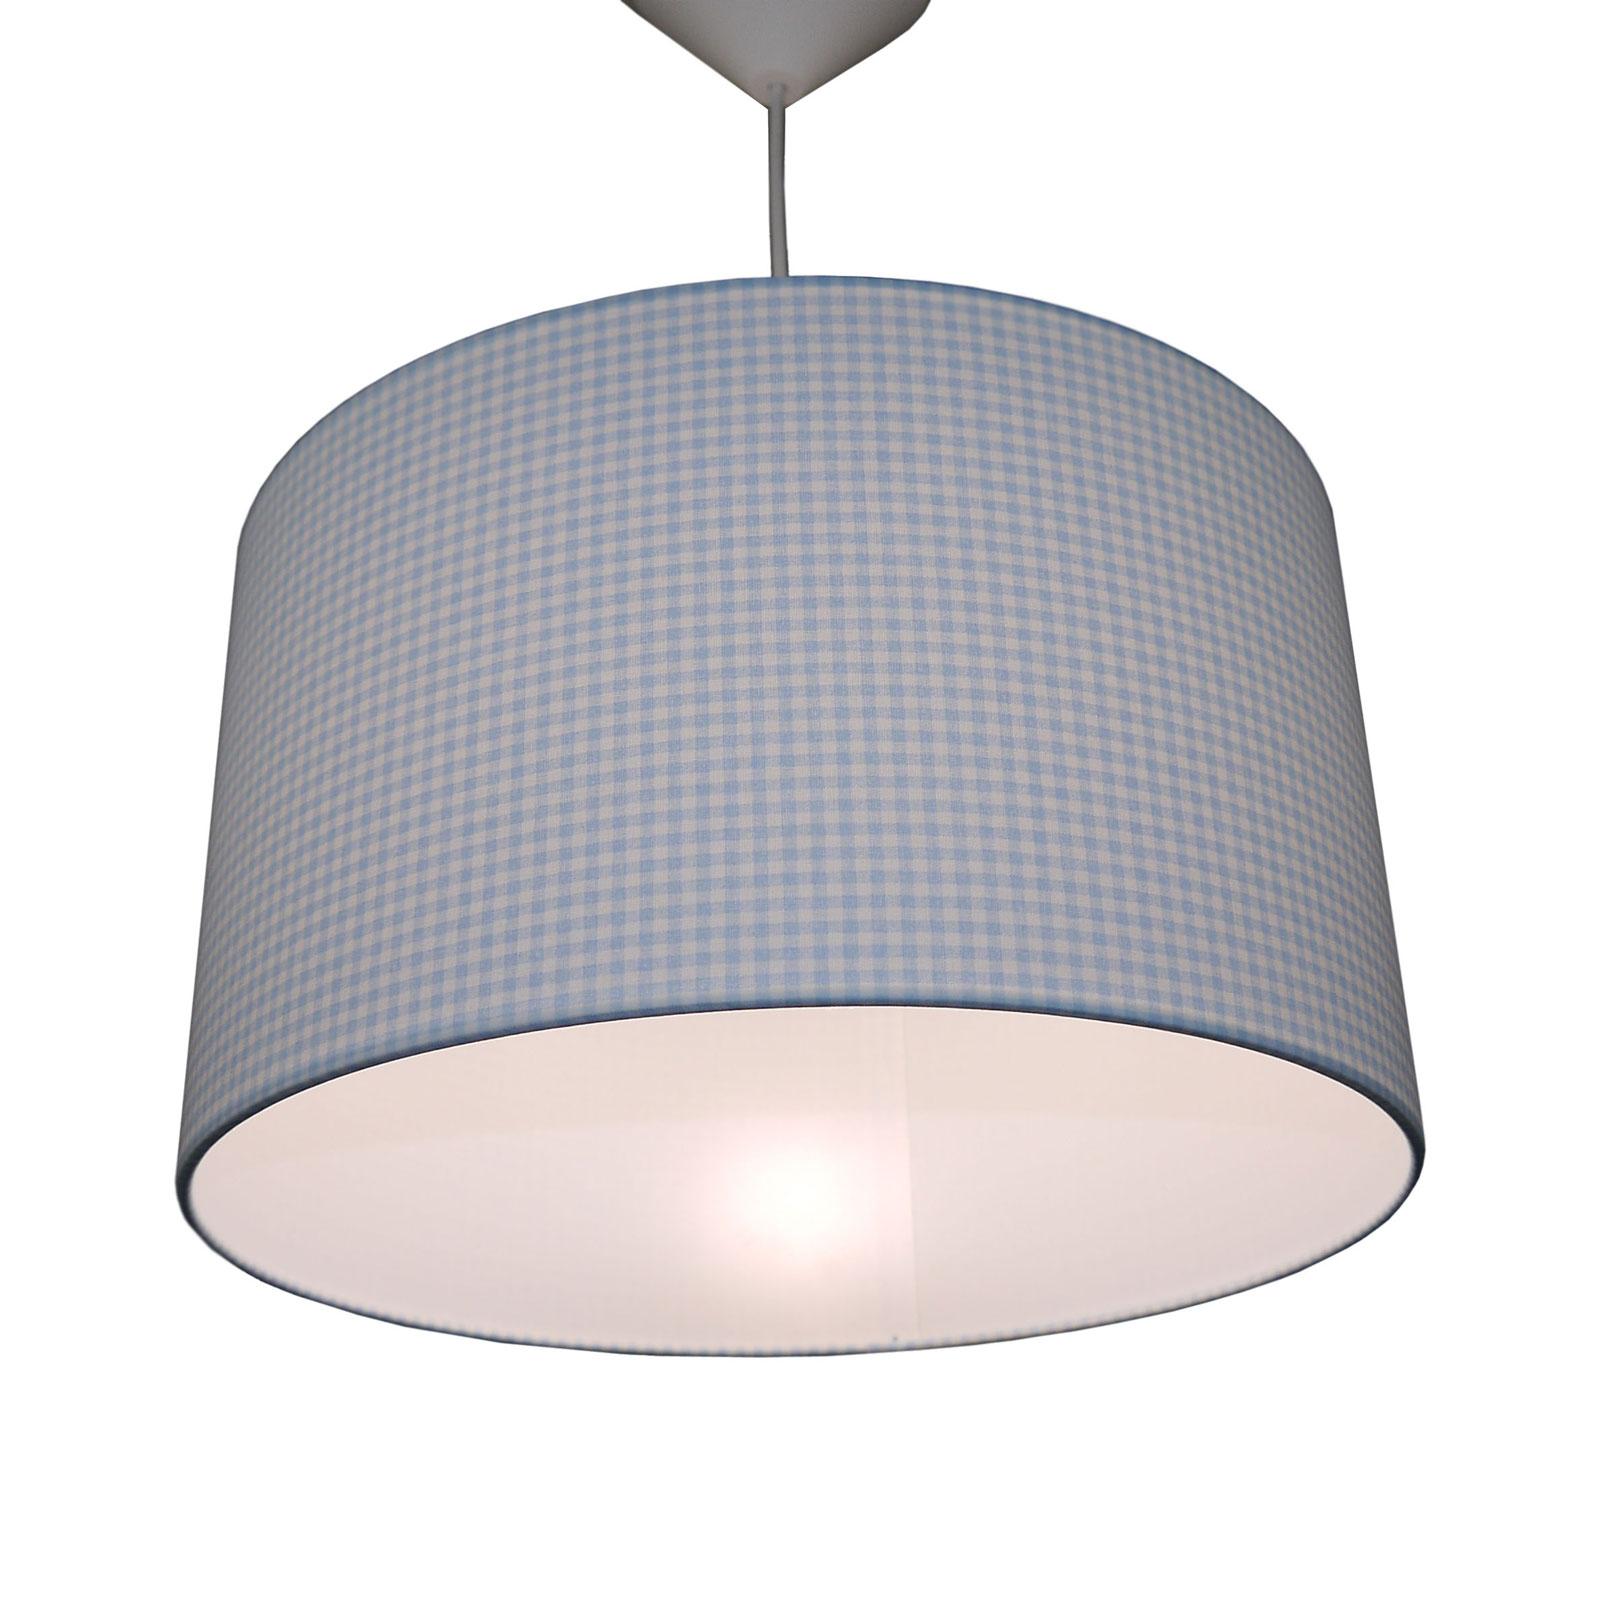 Hanglamp Vichykaro, lichtblauw